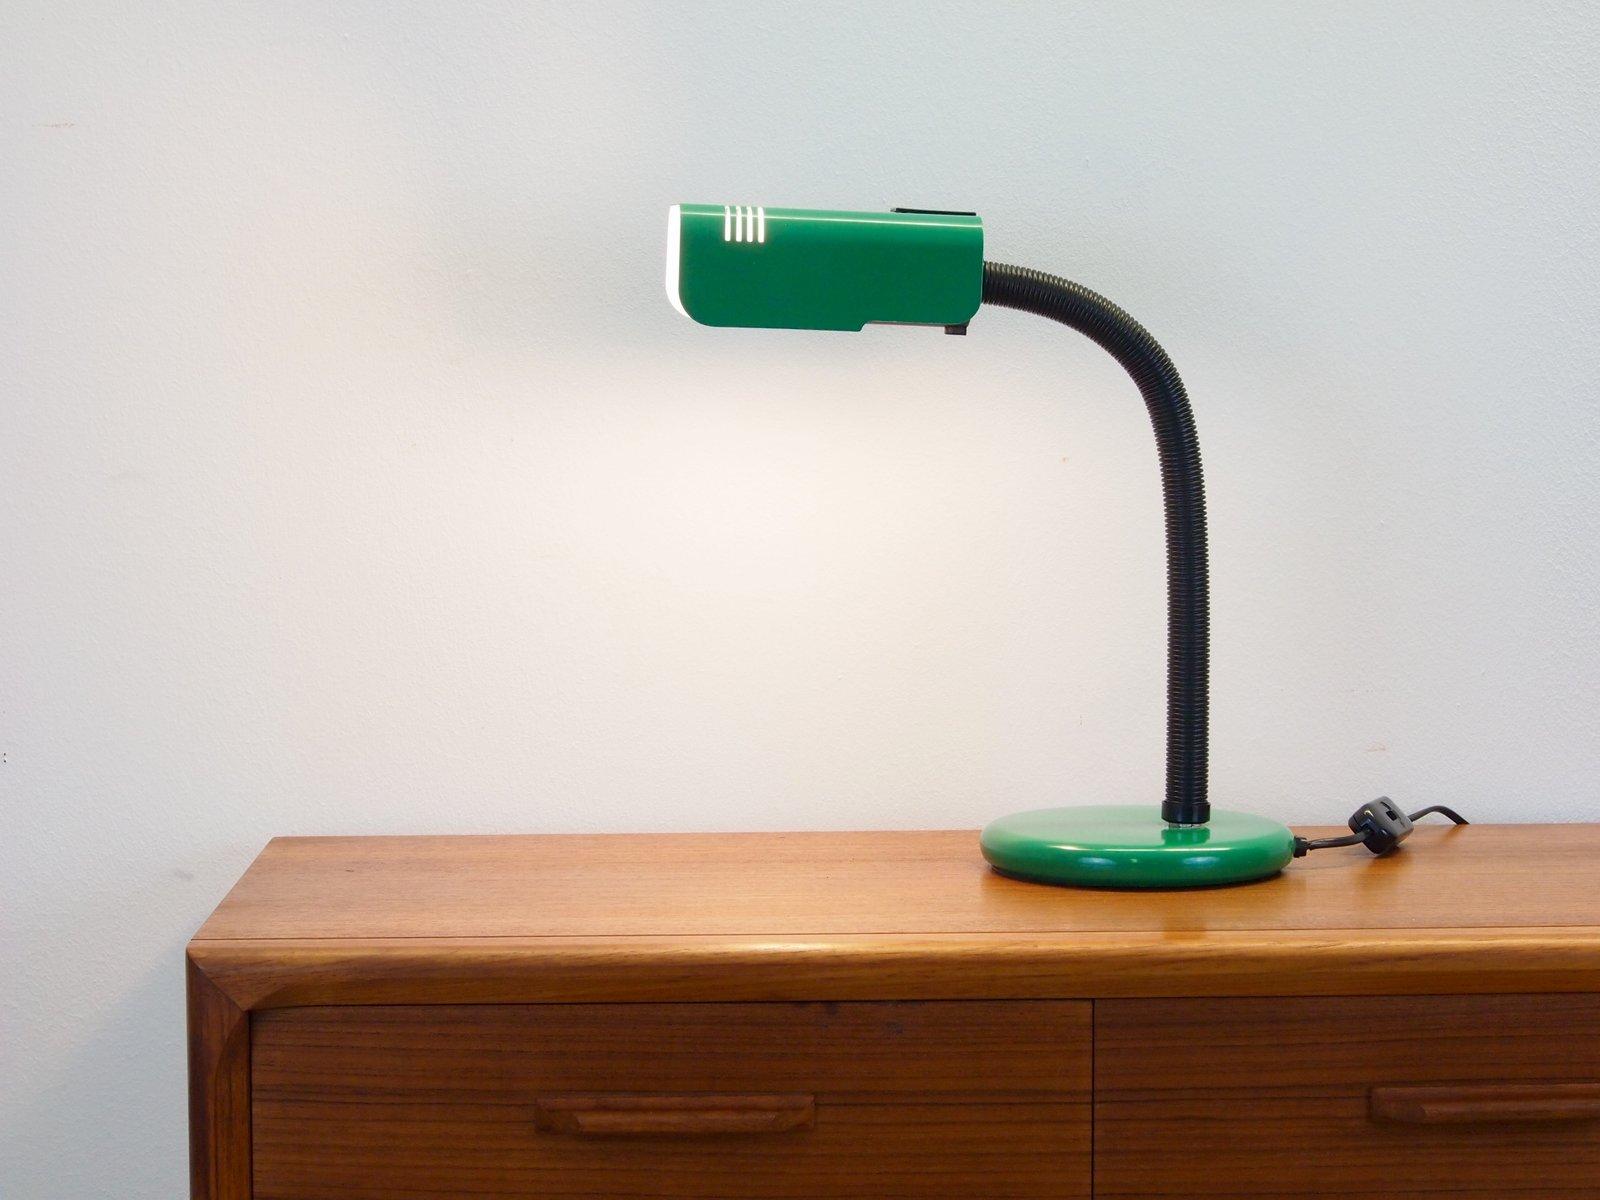 lampe de bureau vintage de targetti sankey en vente sur pamono. Black Bedroom Furniture Sets. Home Design Ideas